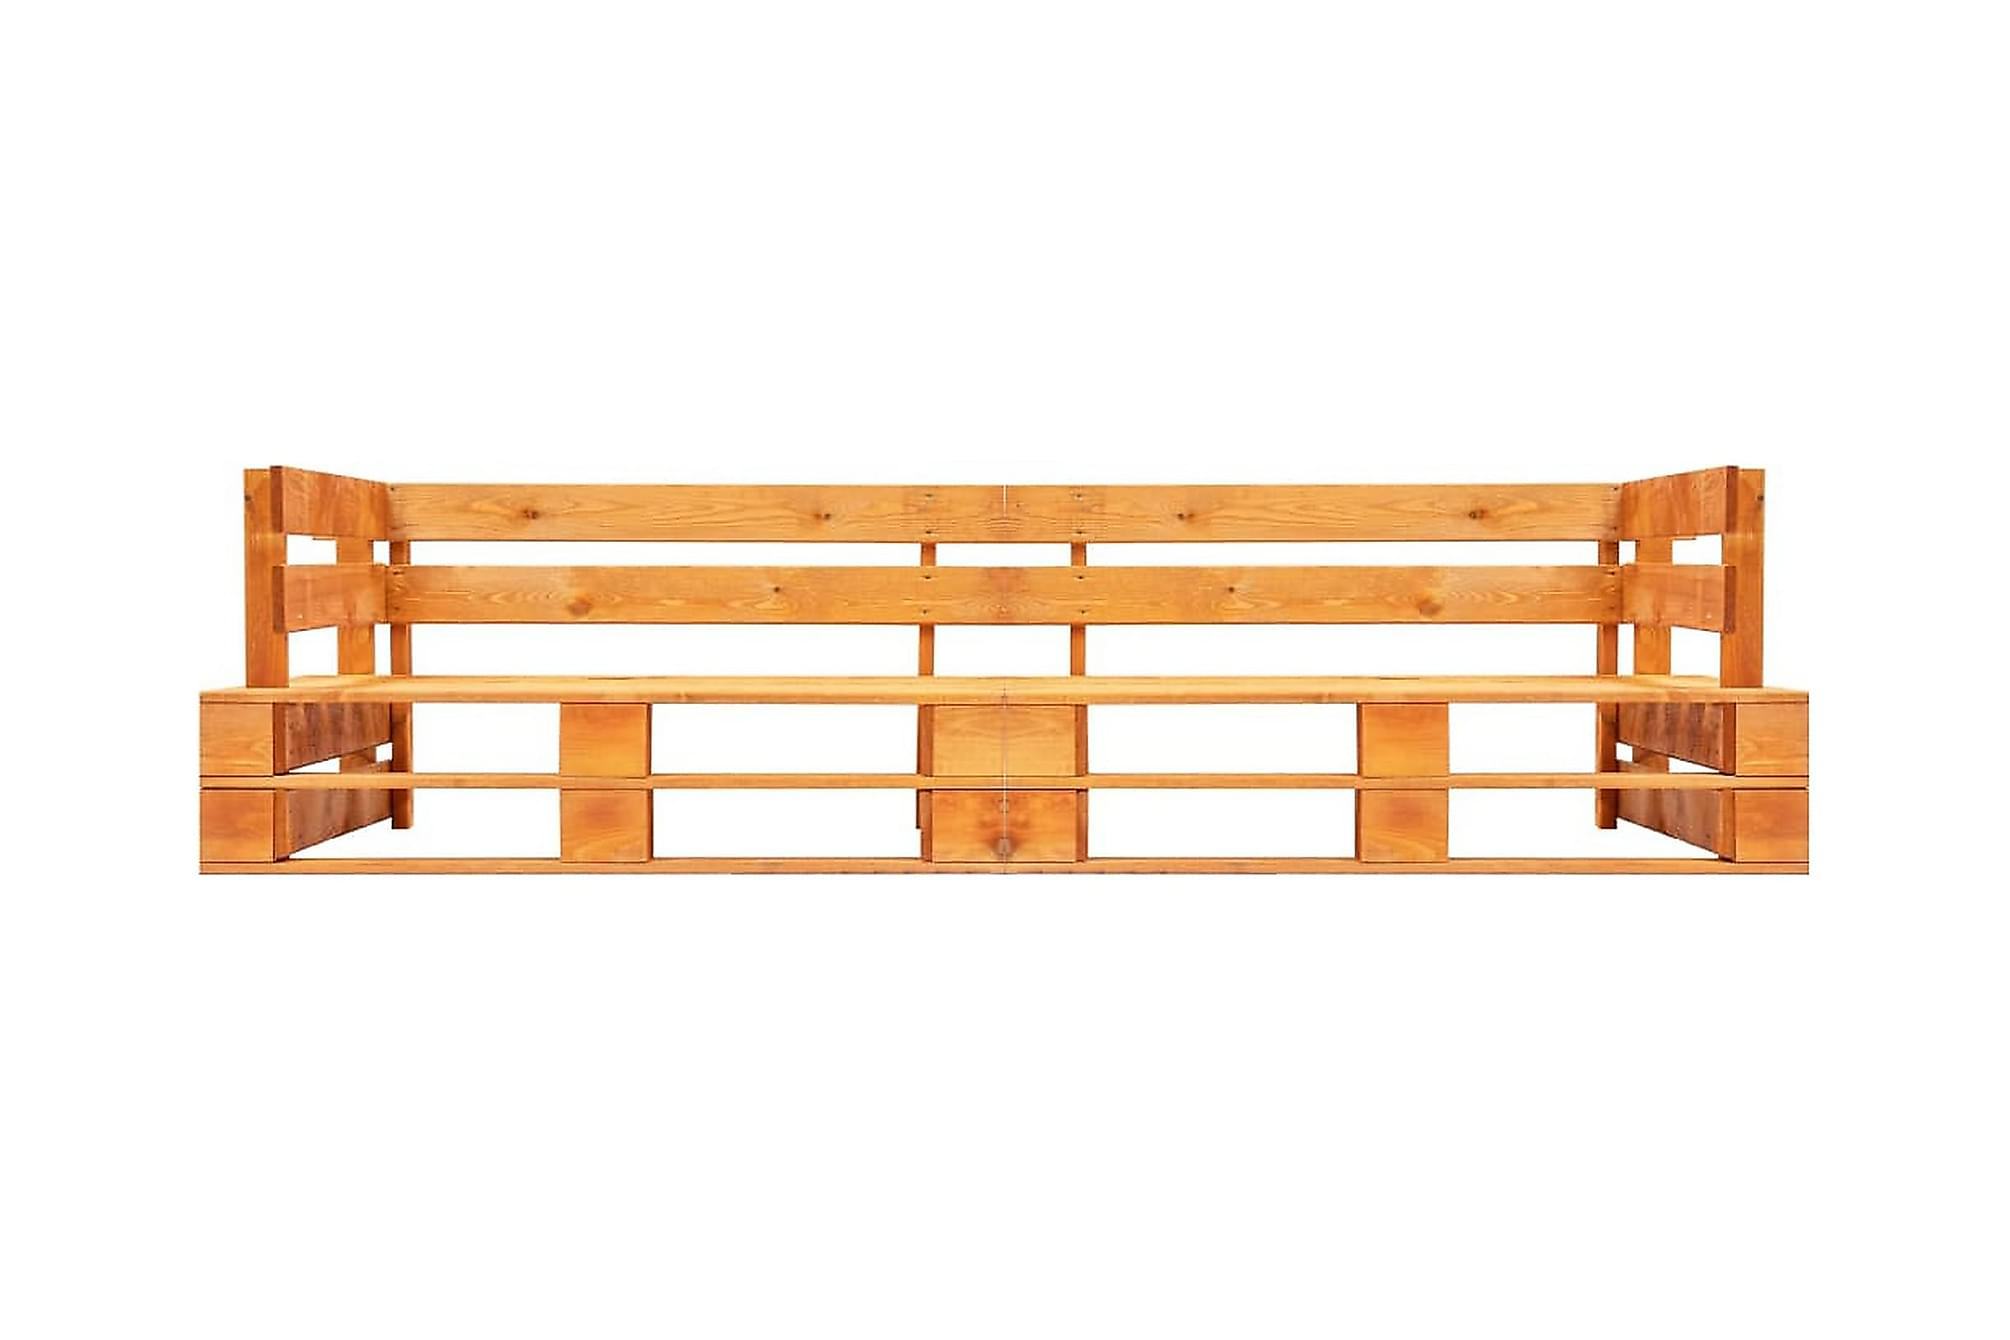 Pallsoffa 2-sits honungsbrun trä, Loungesoffa